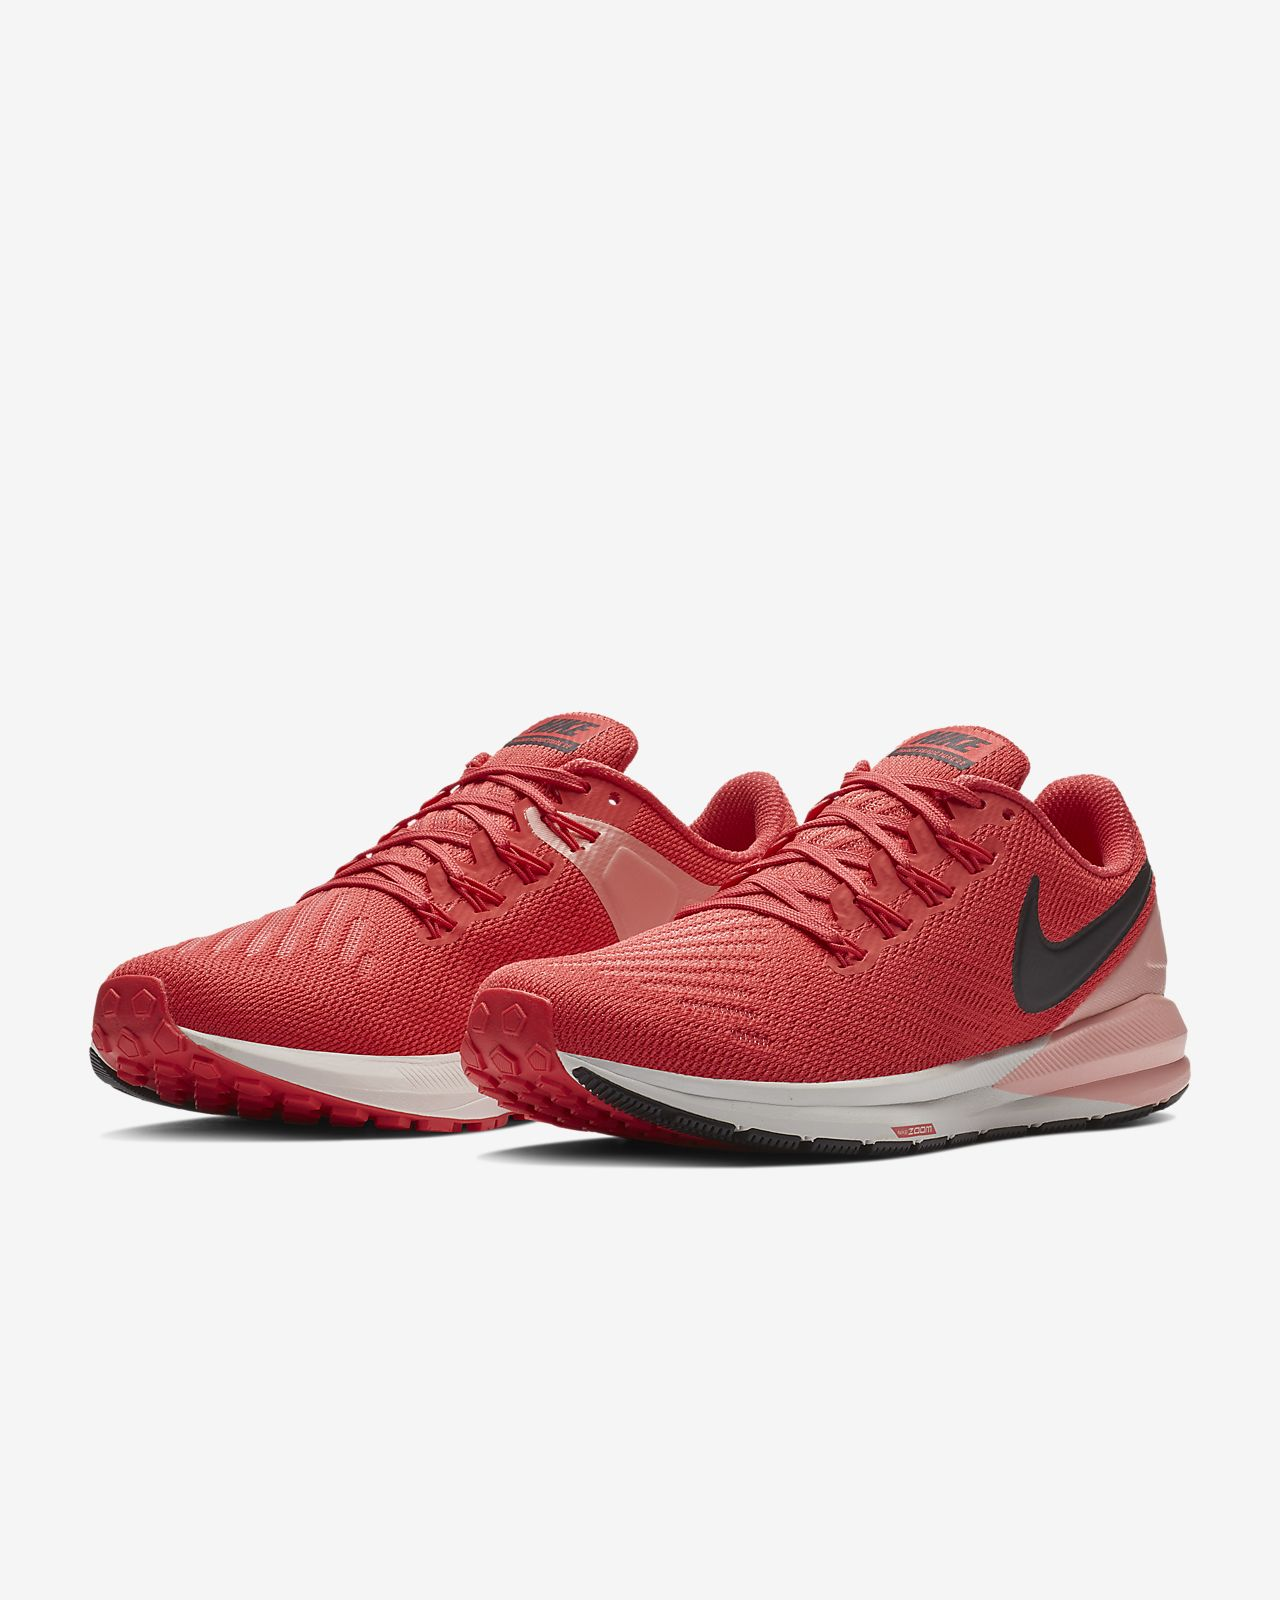 3417ad31997 Nike Air Zoom Structure 22 Zapatillas de running - Mujer. Nike.com ES